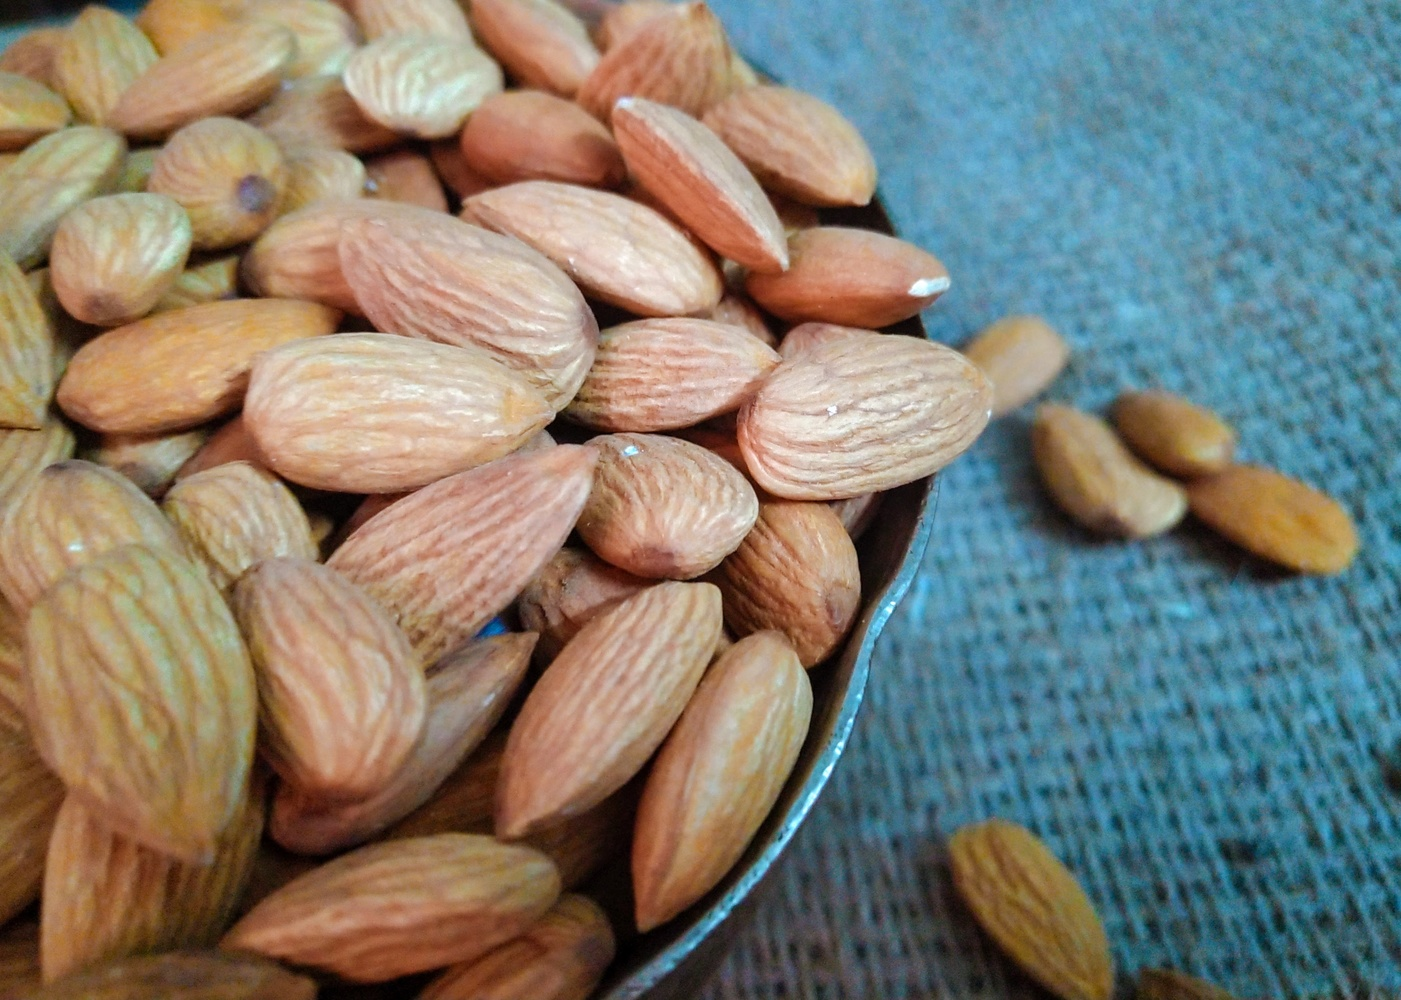 california almonds by Melapplon .